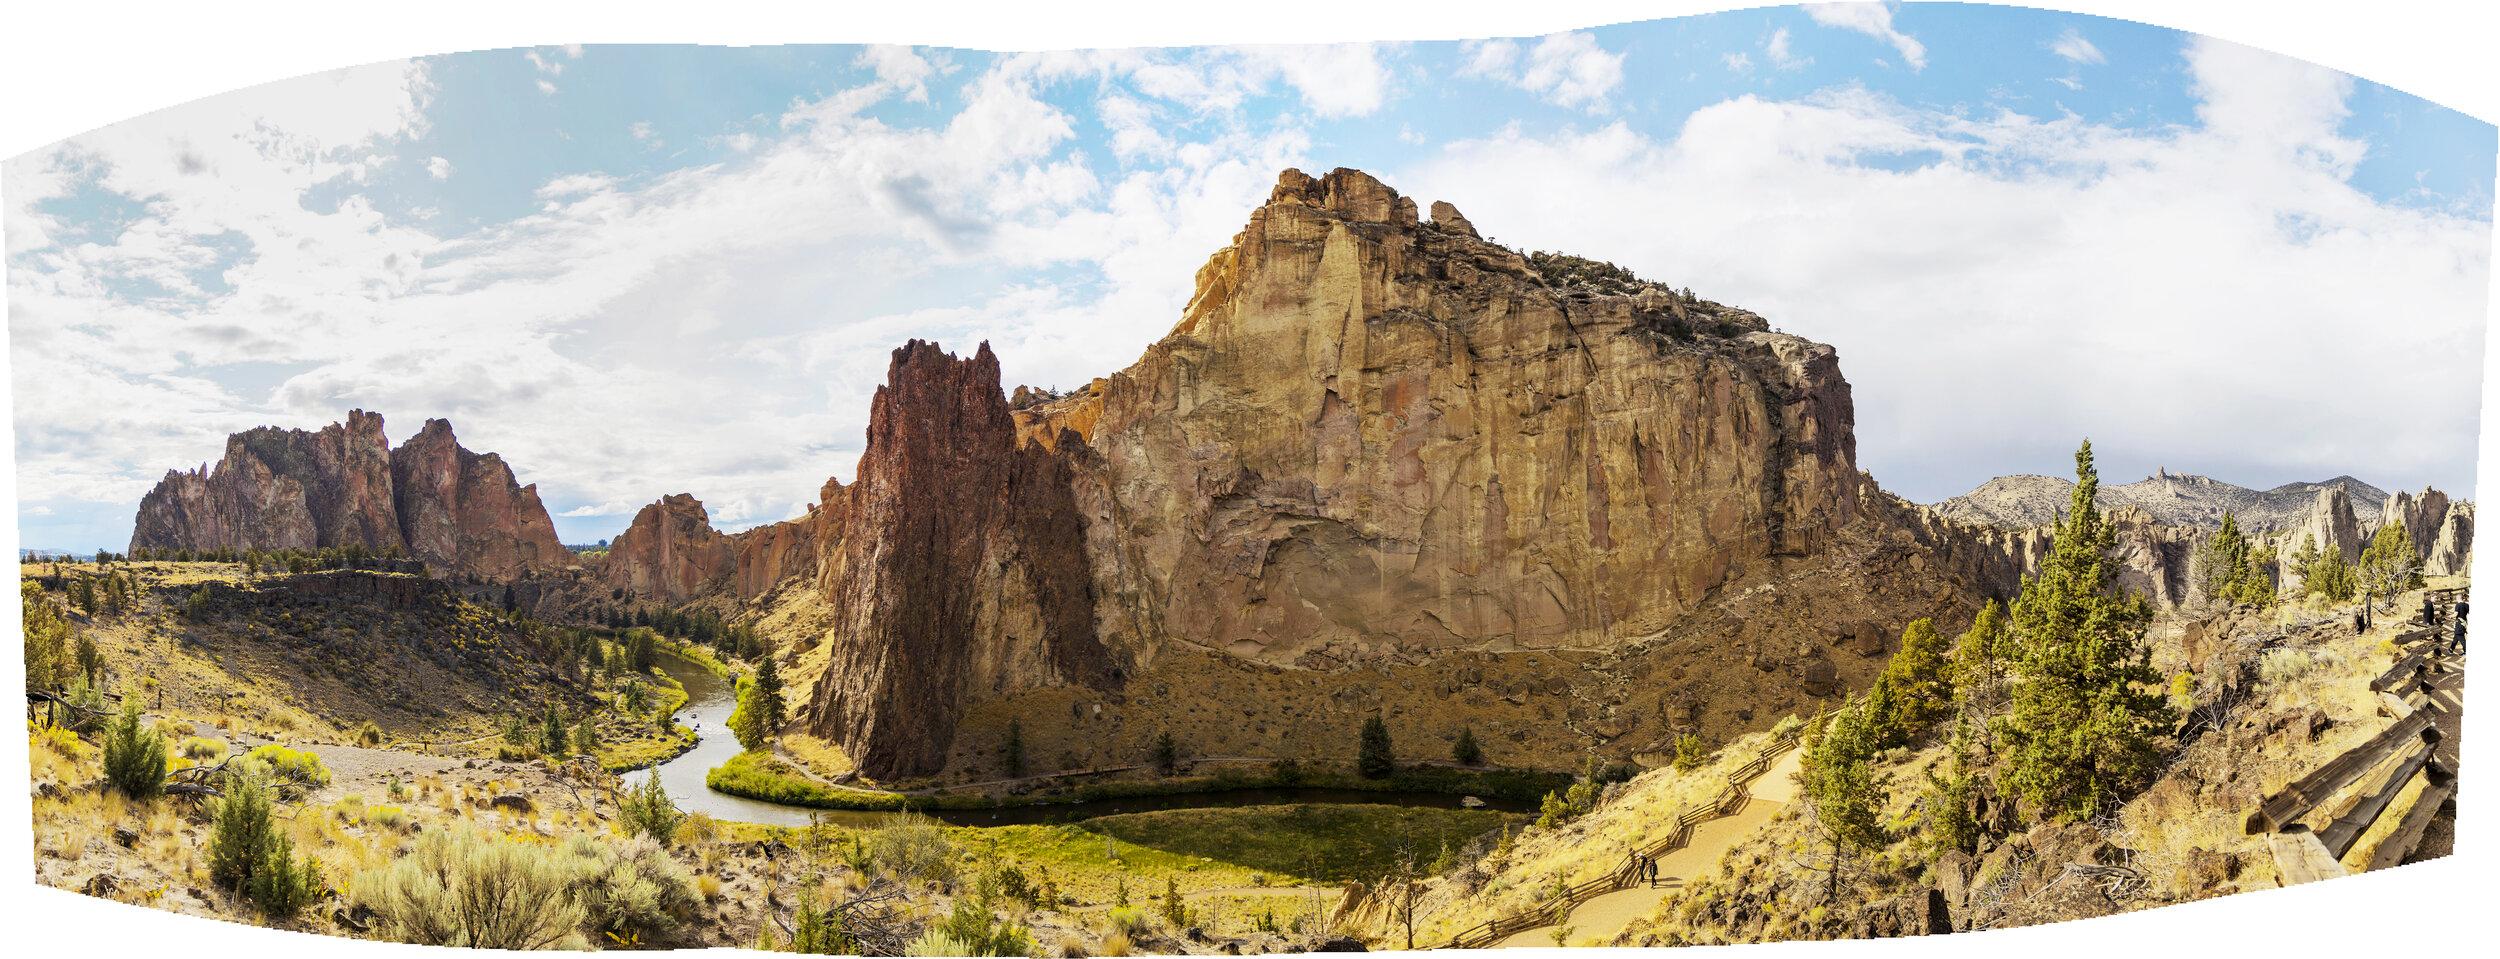 Smith Rock Panorama copy.jpg